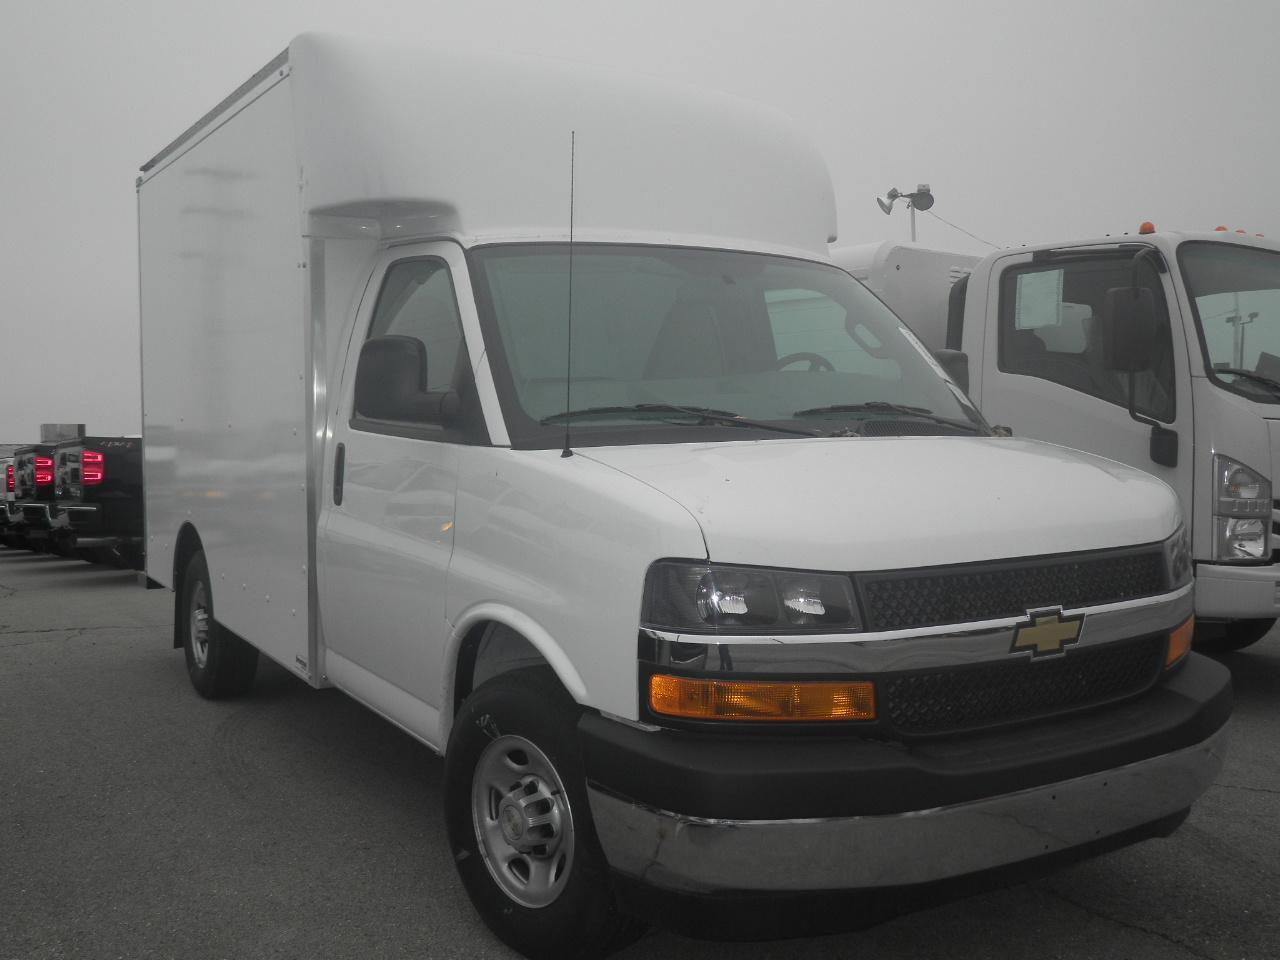 2018 Chevrolet Express Cutaway 1WT Truck